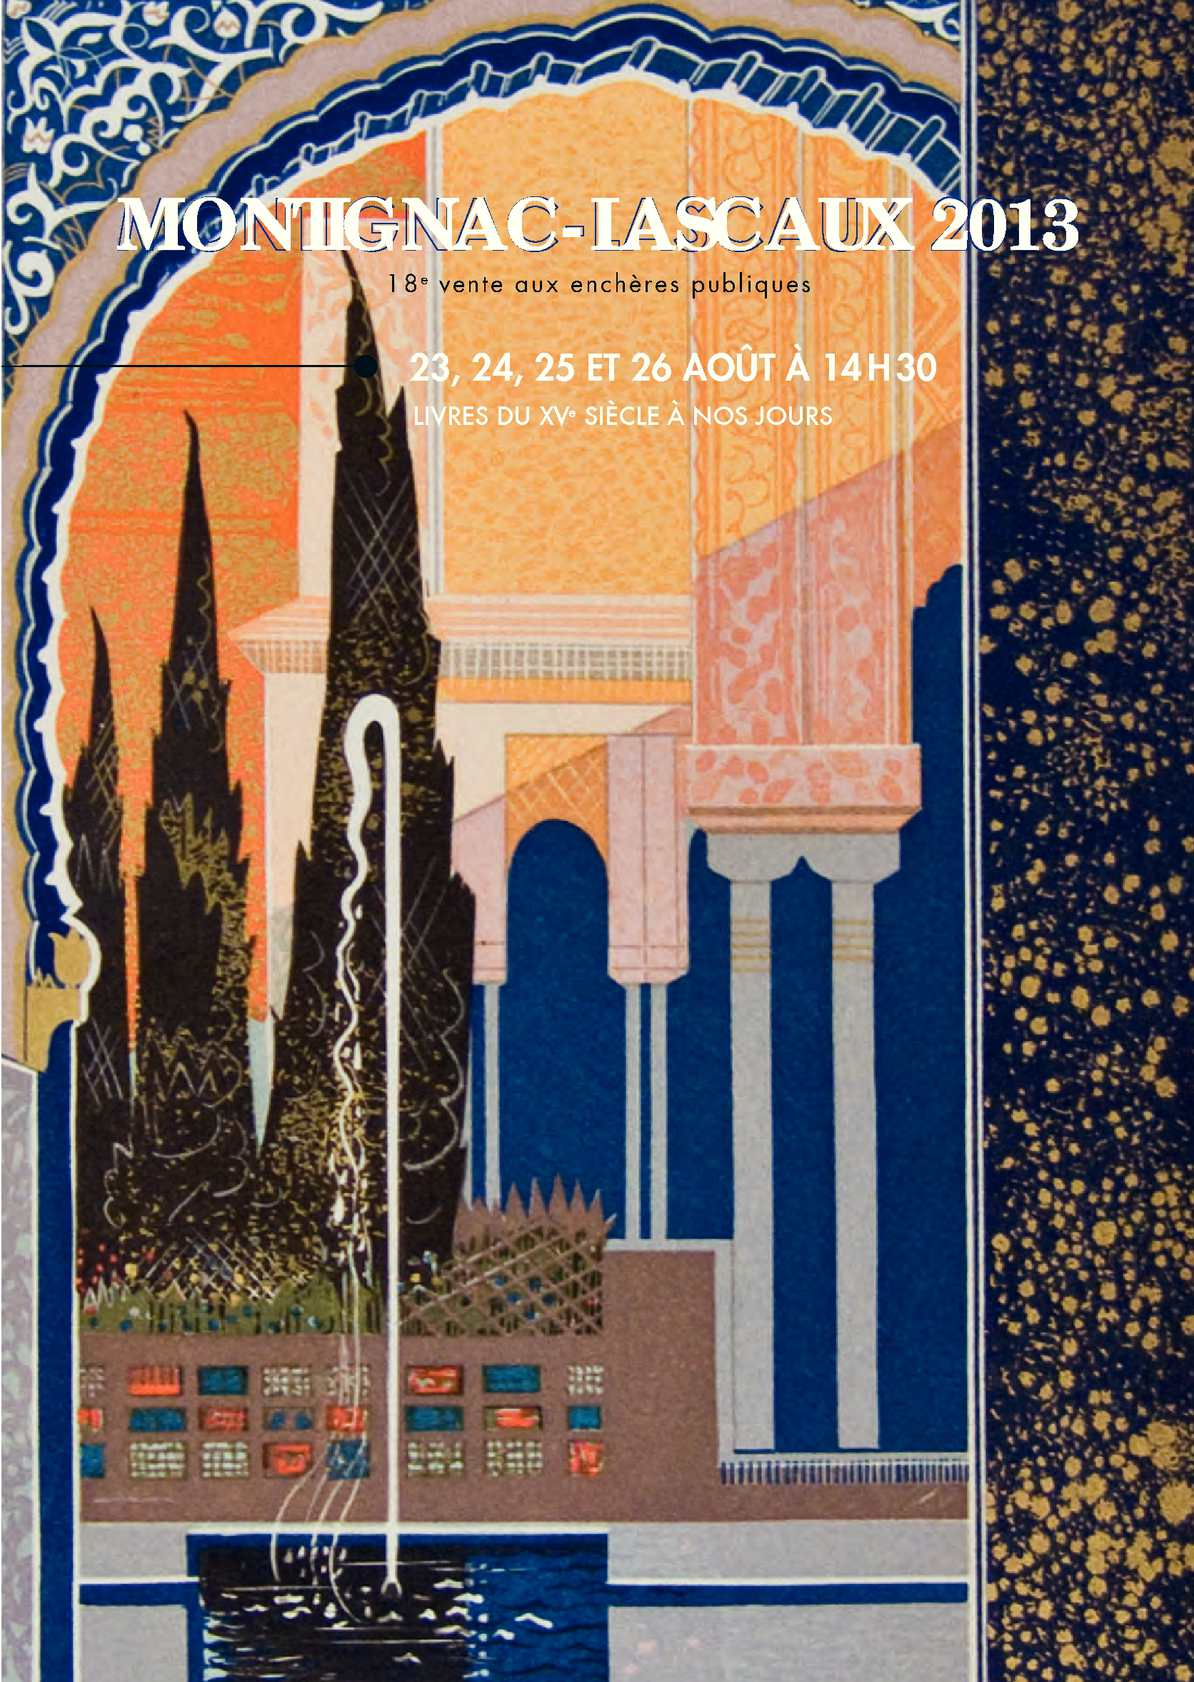 95f43c4760 Calaméo - Catalogue Montignac 23 au 26 août 2013